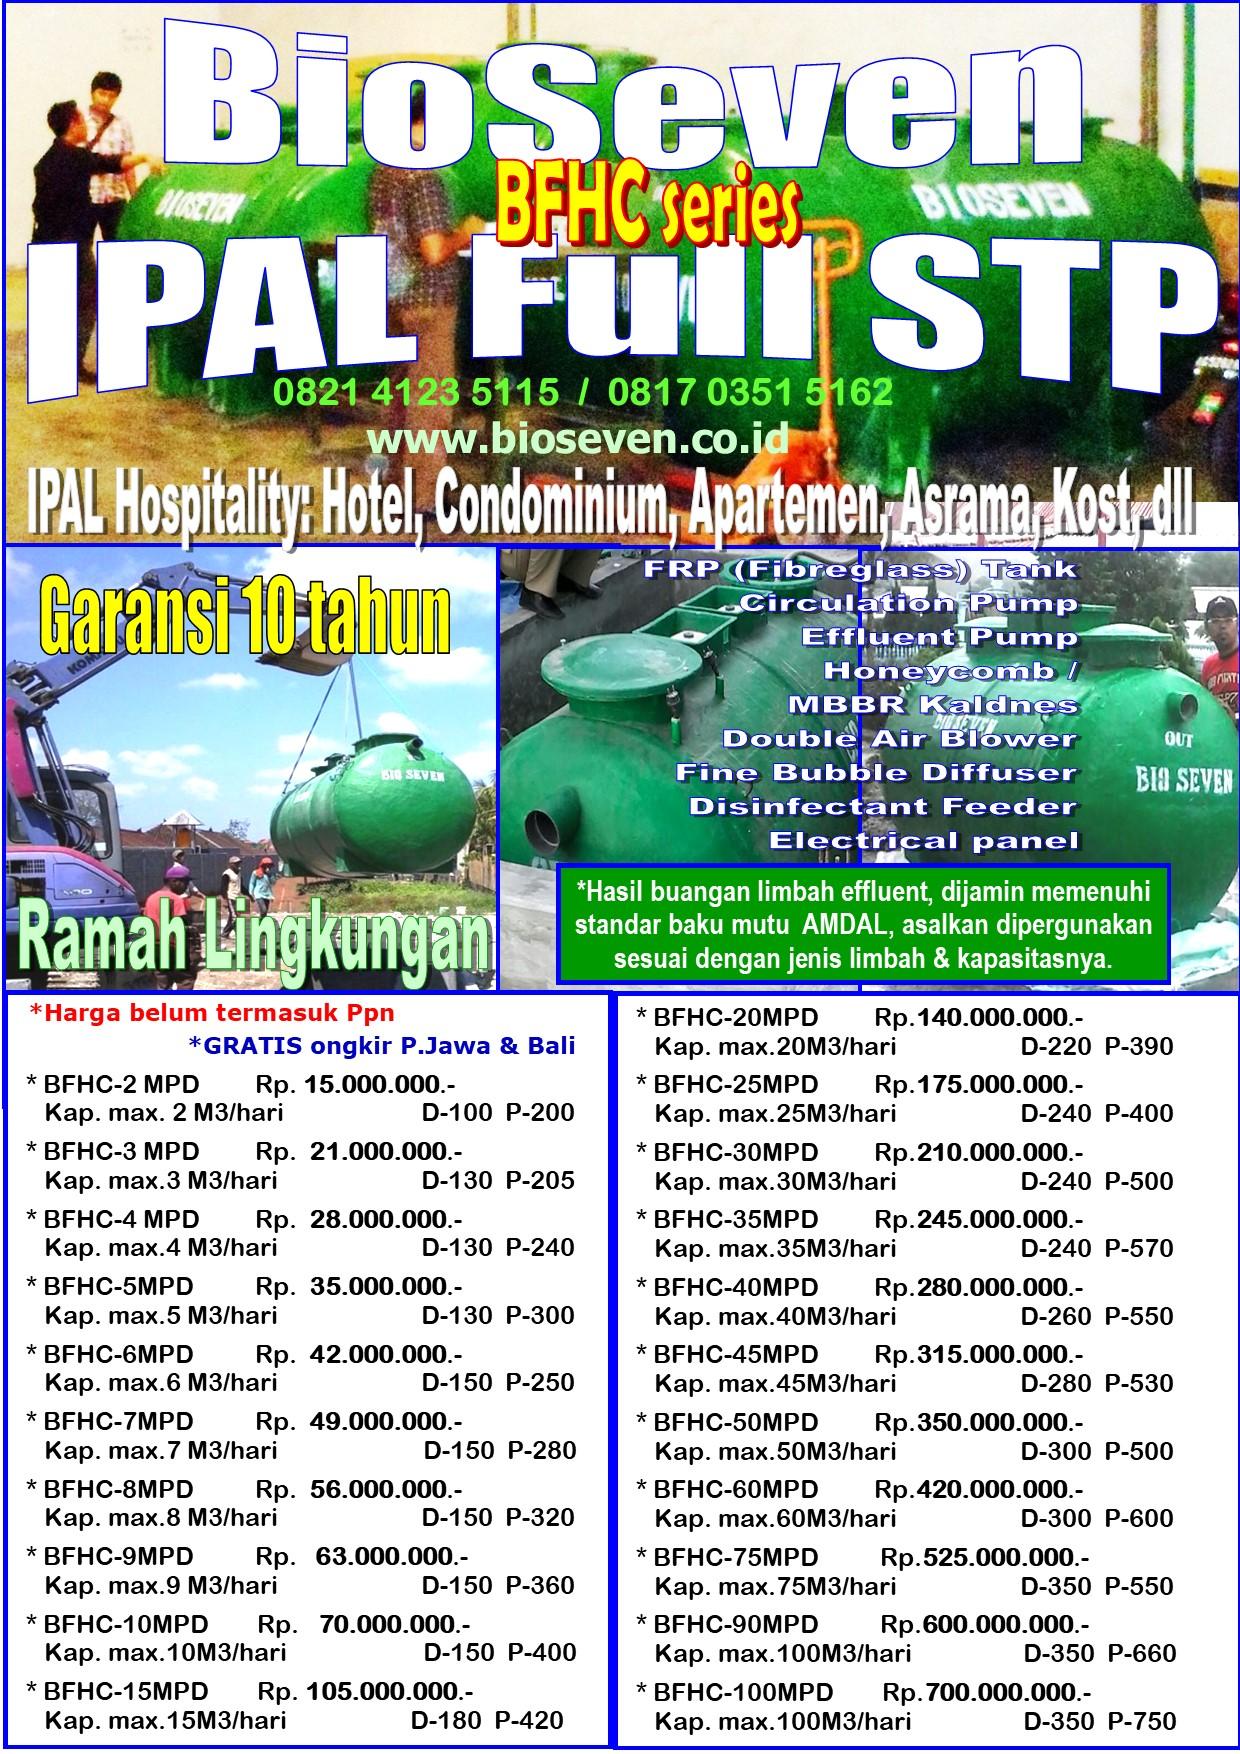 IPAL Bio FULL STP Anaerob + FULL Aerob - DOUBLE Blower & Pump (BFHC series)  - untuk mengolah Limbah Hospitality (msl. Hotel, Condotel, Condominium, Apartemen, Villatel, Dormatori, dll)